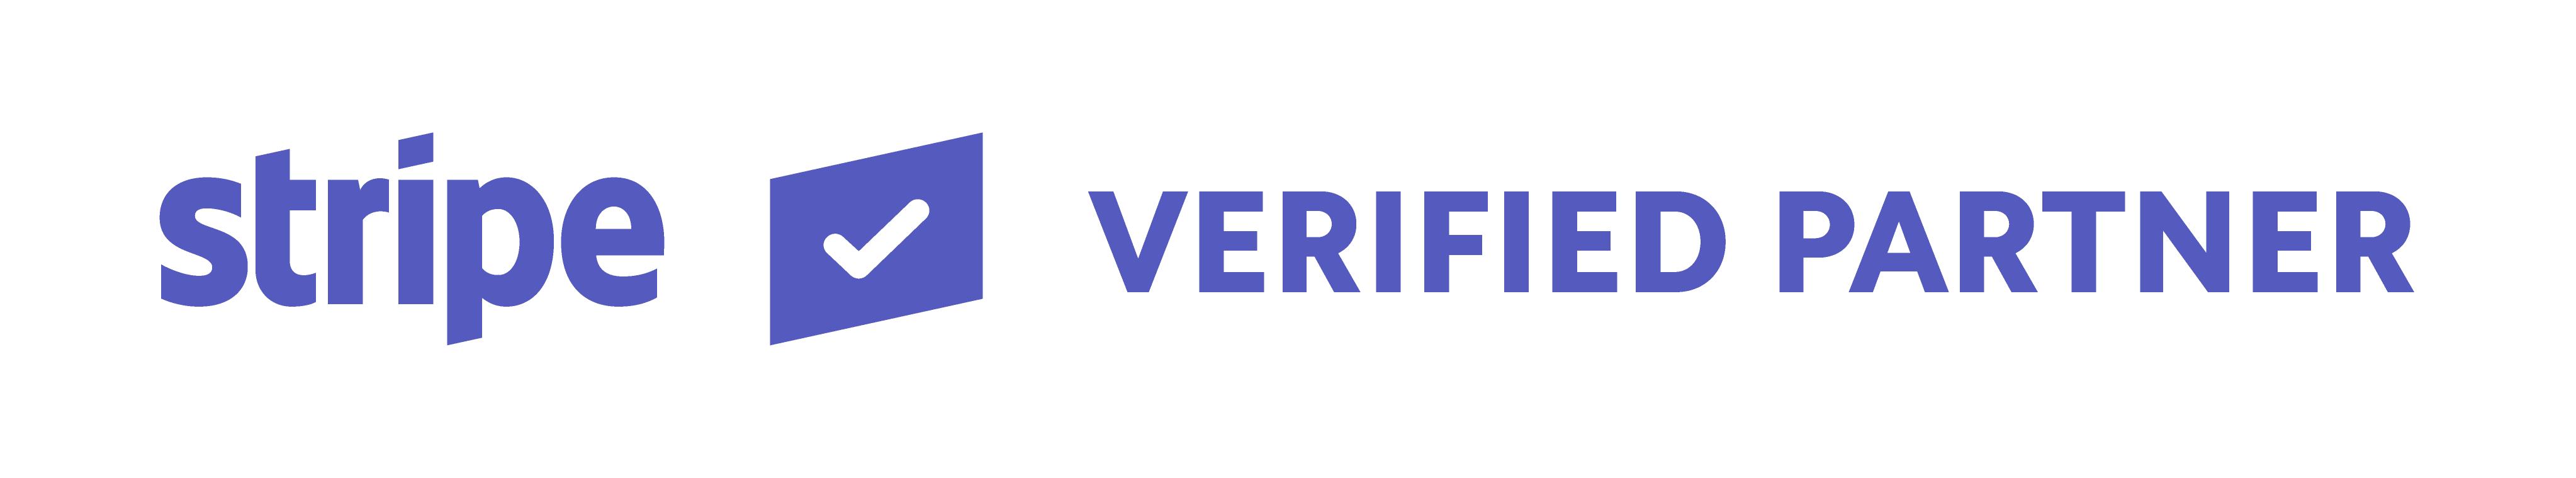 Stripe Verified Partner Tag